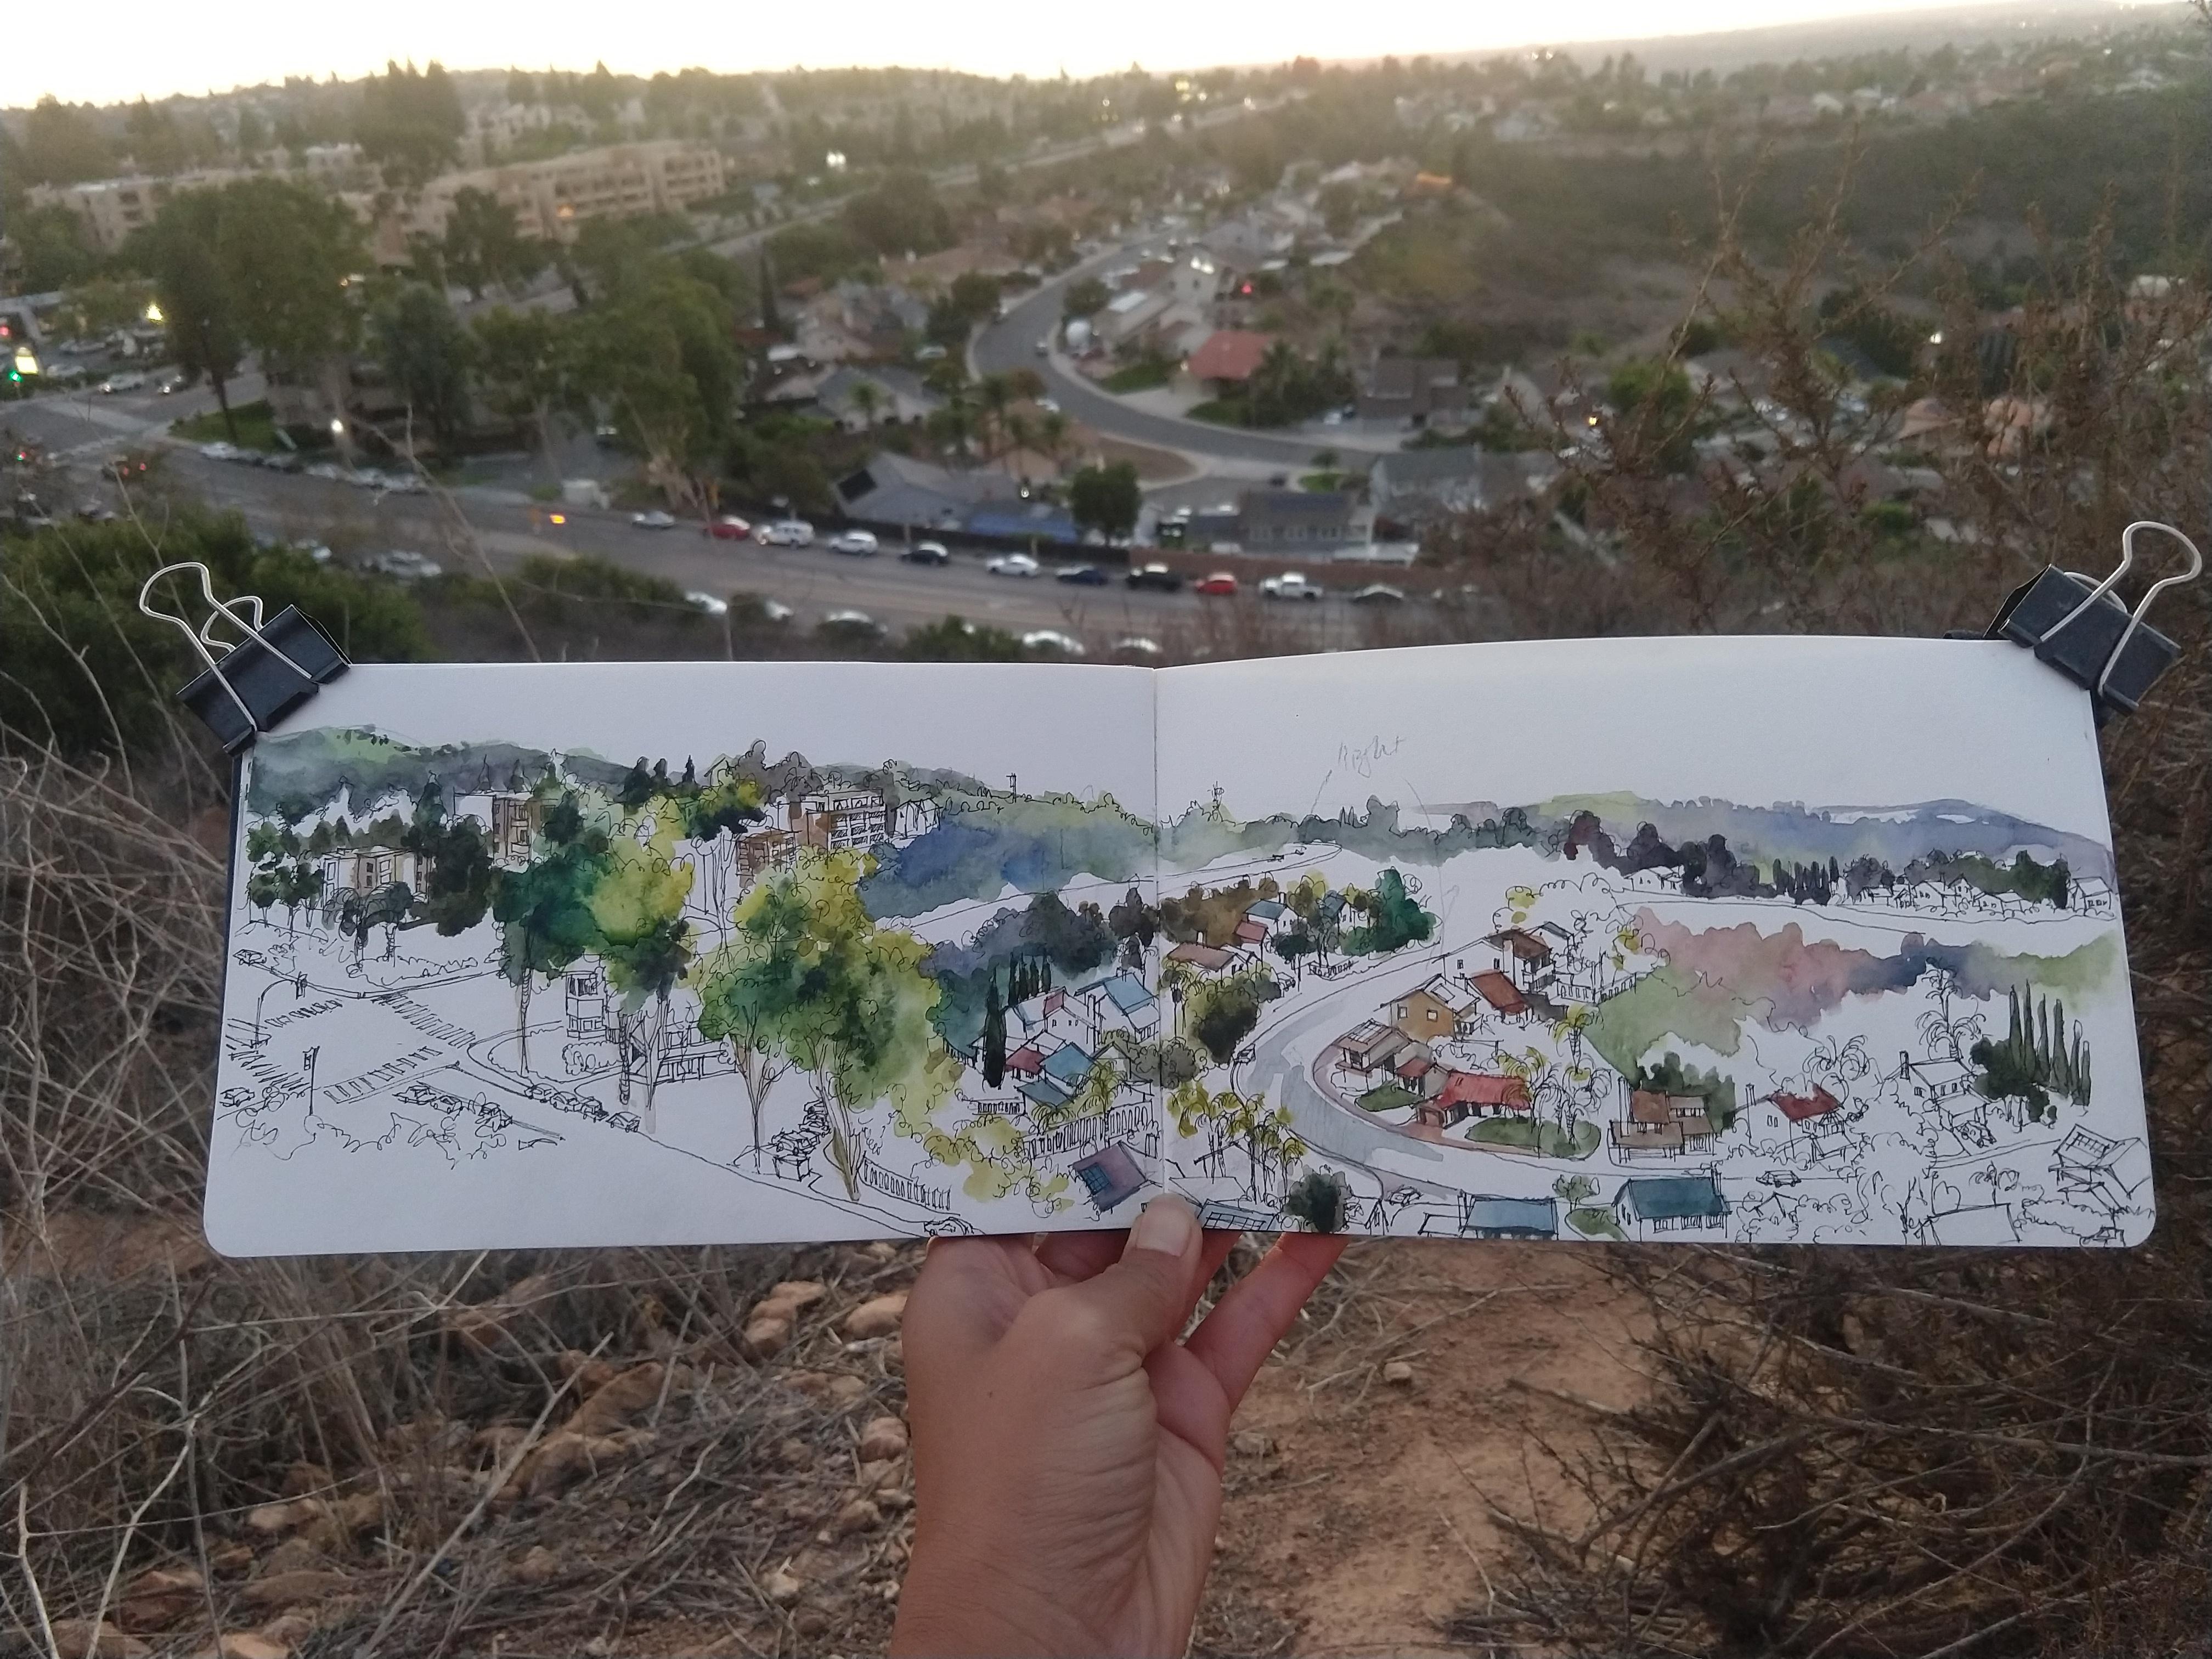 Sunset in San Diego In Progress